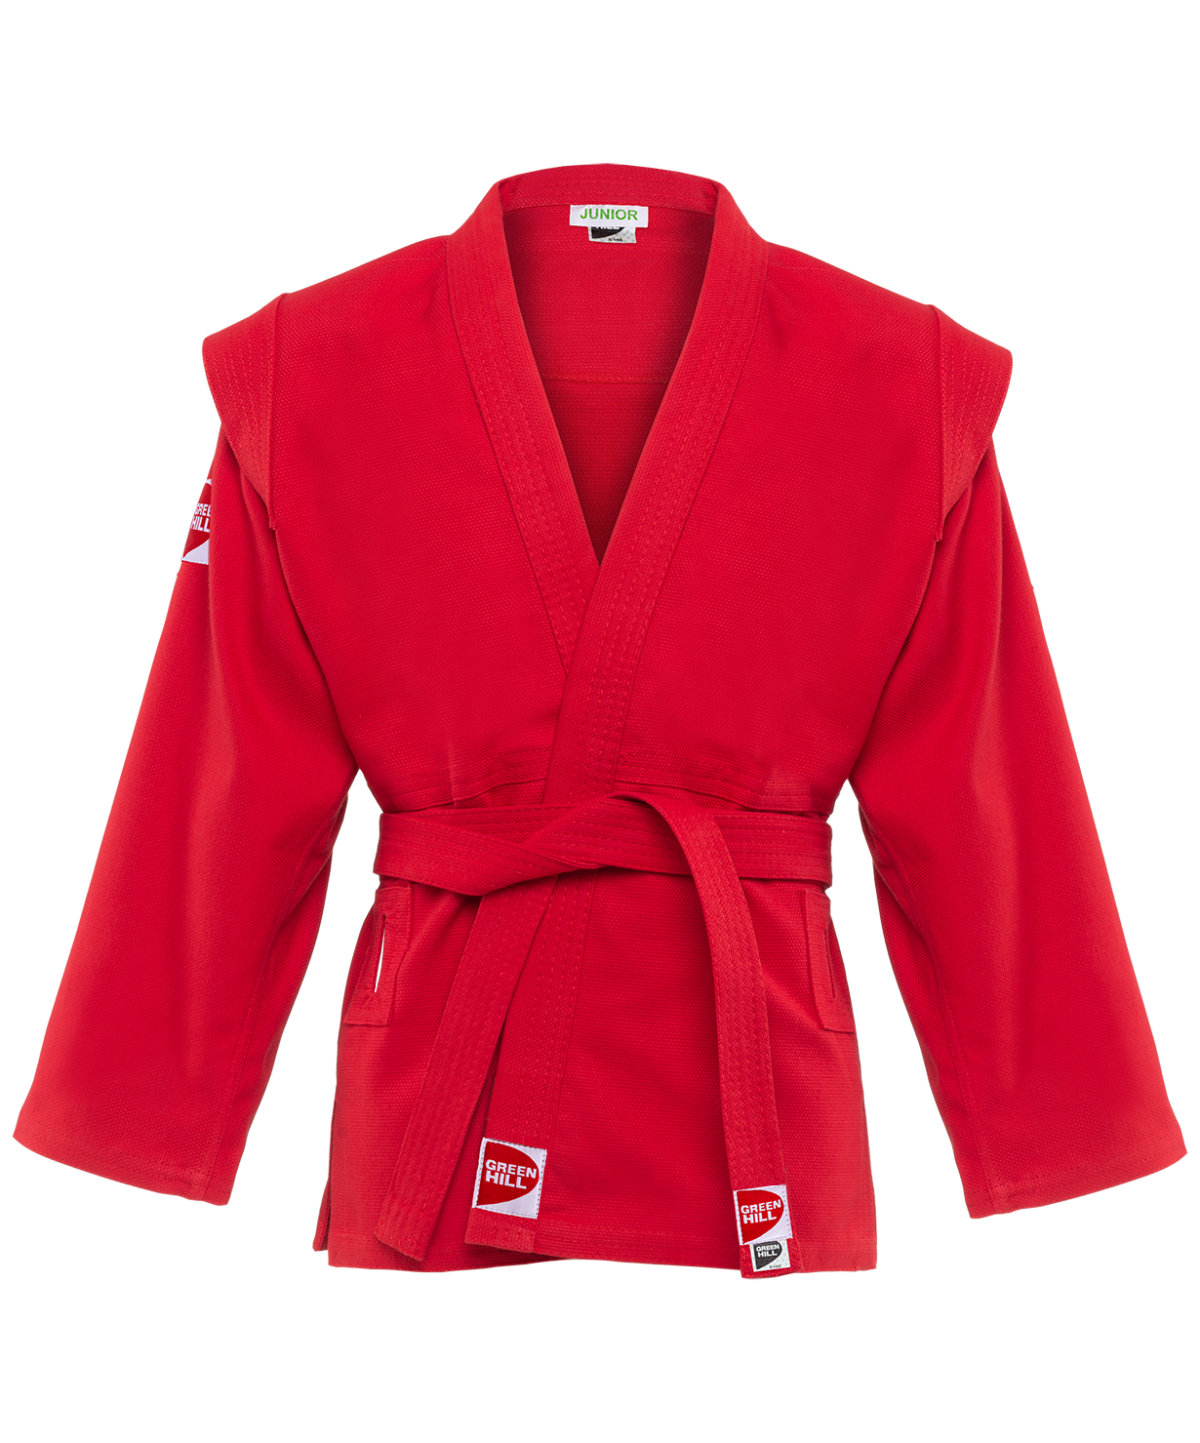 GREEN HILL Куртка для самбо Junior 1/140  SCJ-2201 - 1